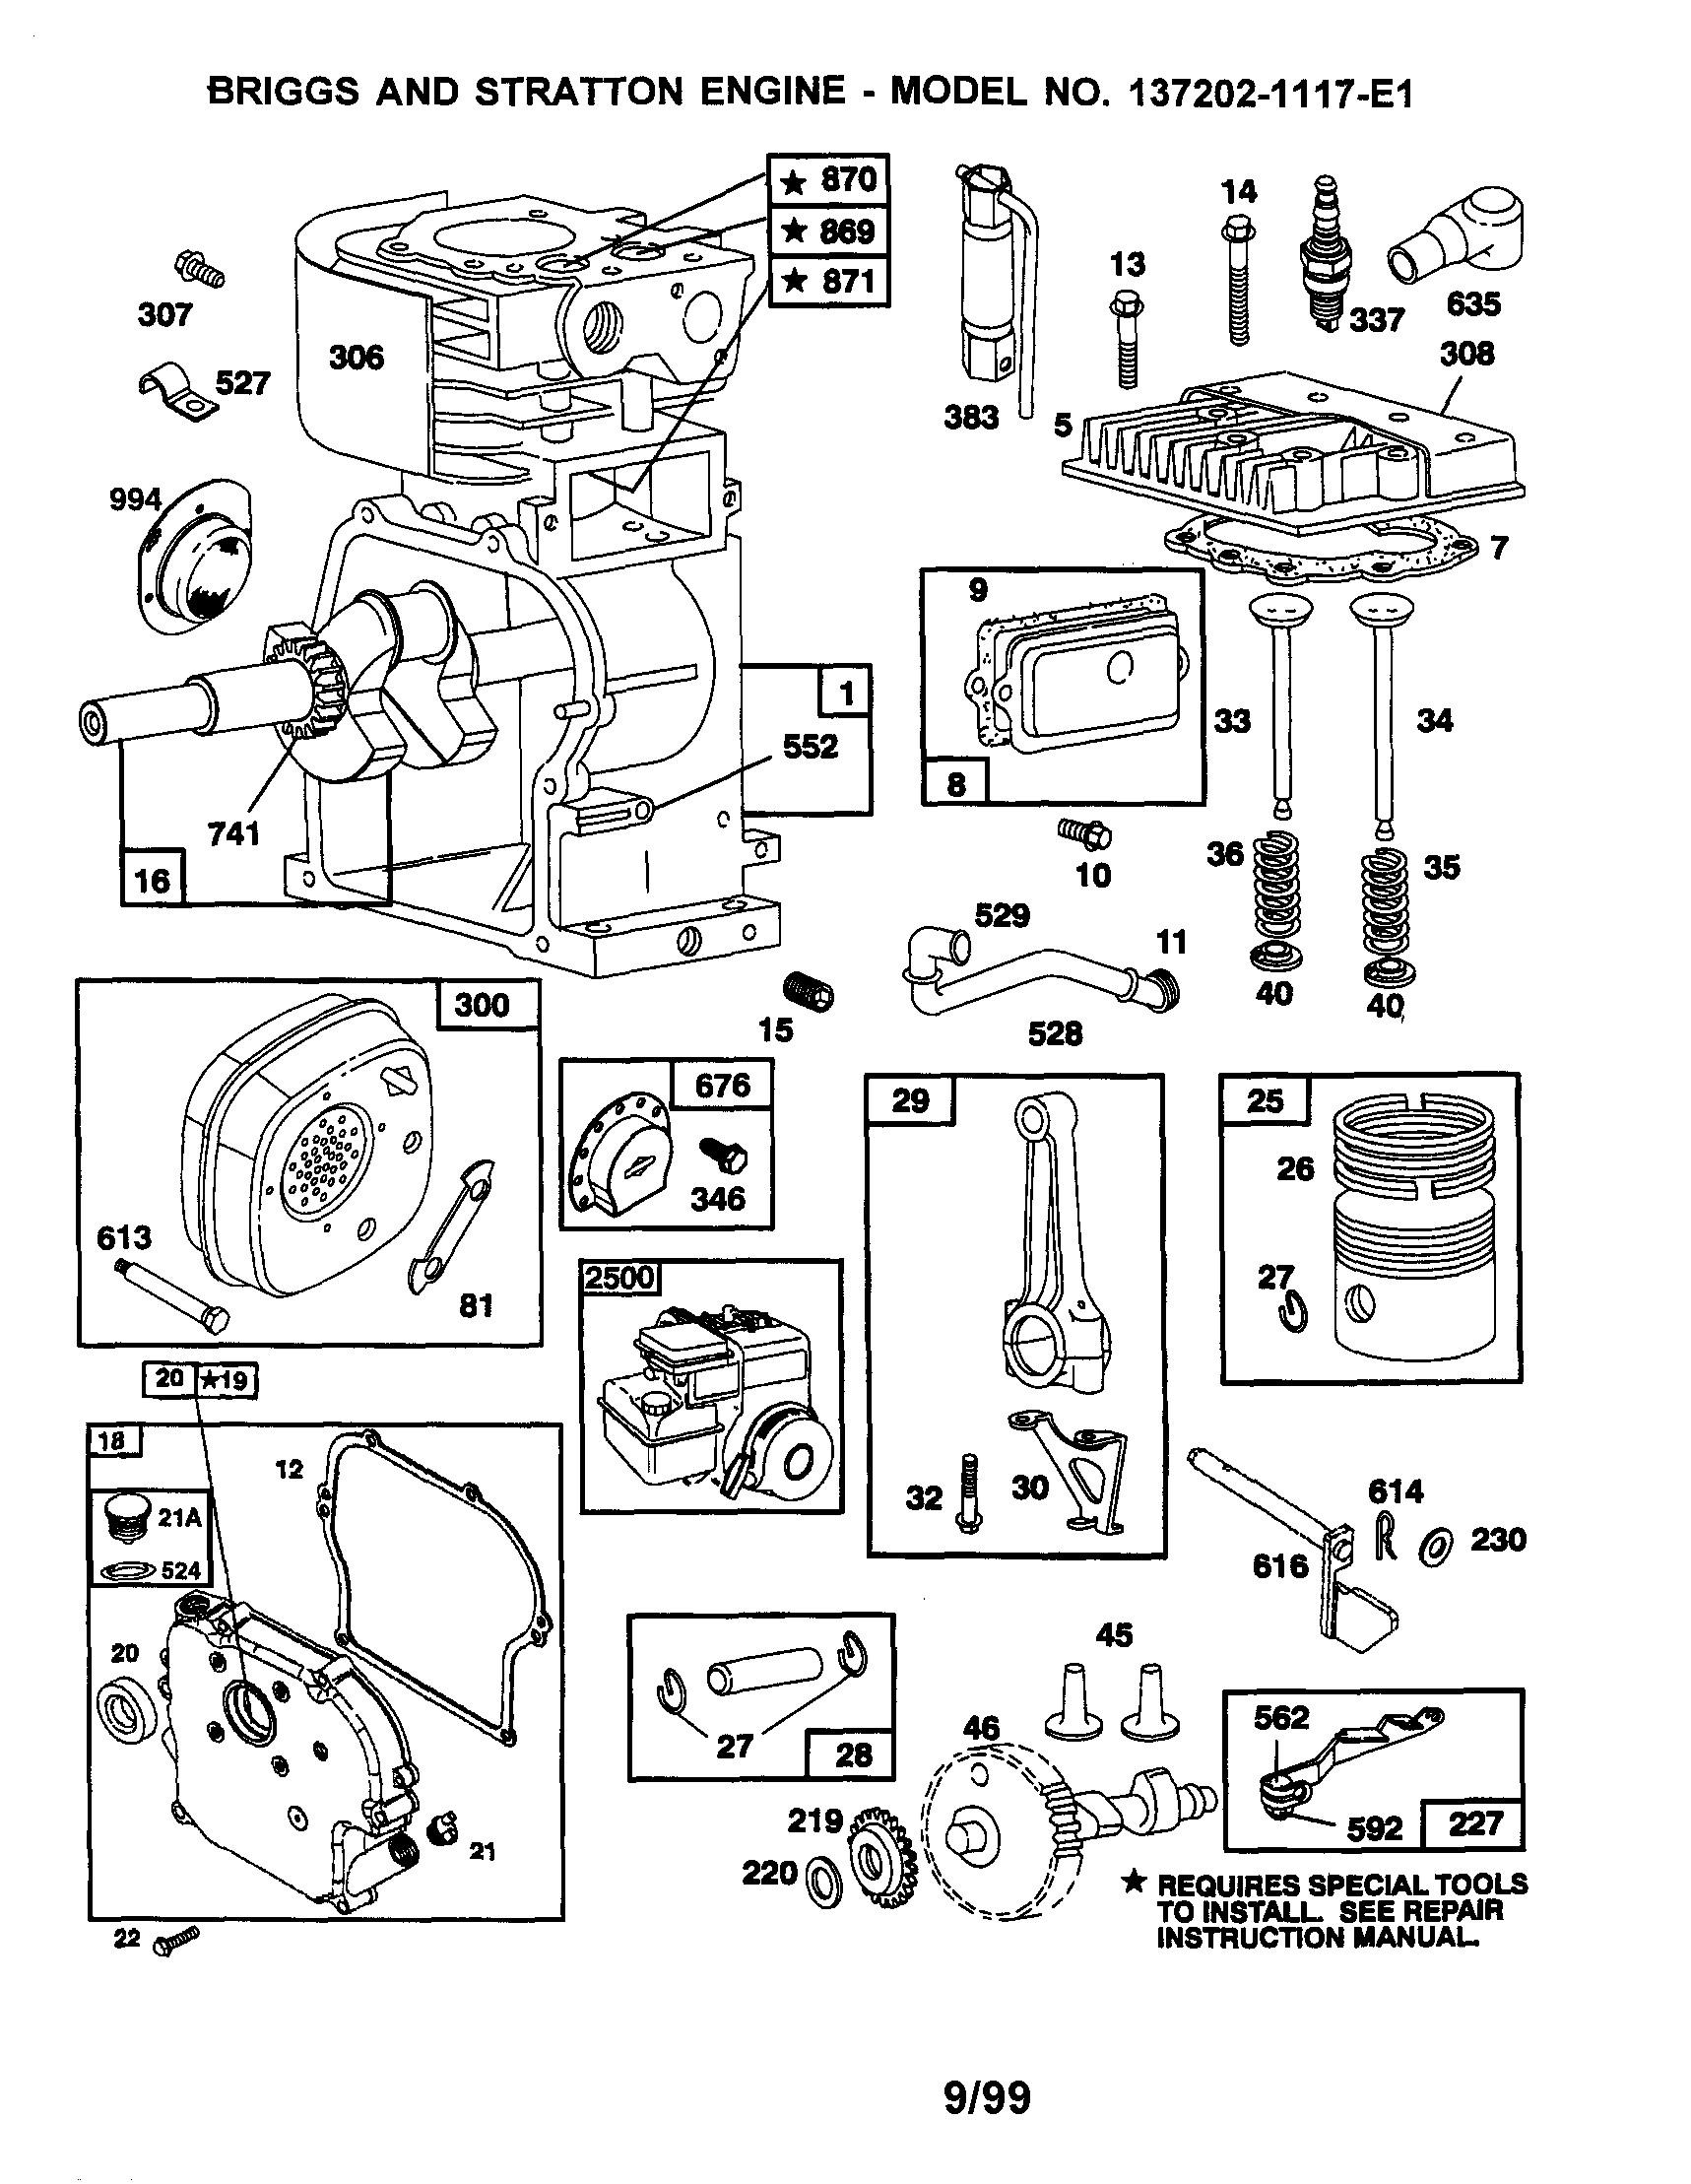 20 Hp Briggs And Stratton Parts Diagram Wiring Mower Engine Lawn Rh Detoxicrecenze Com 26 18